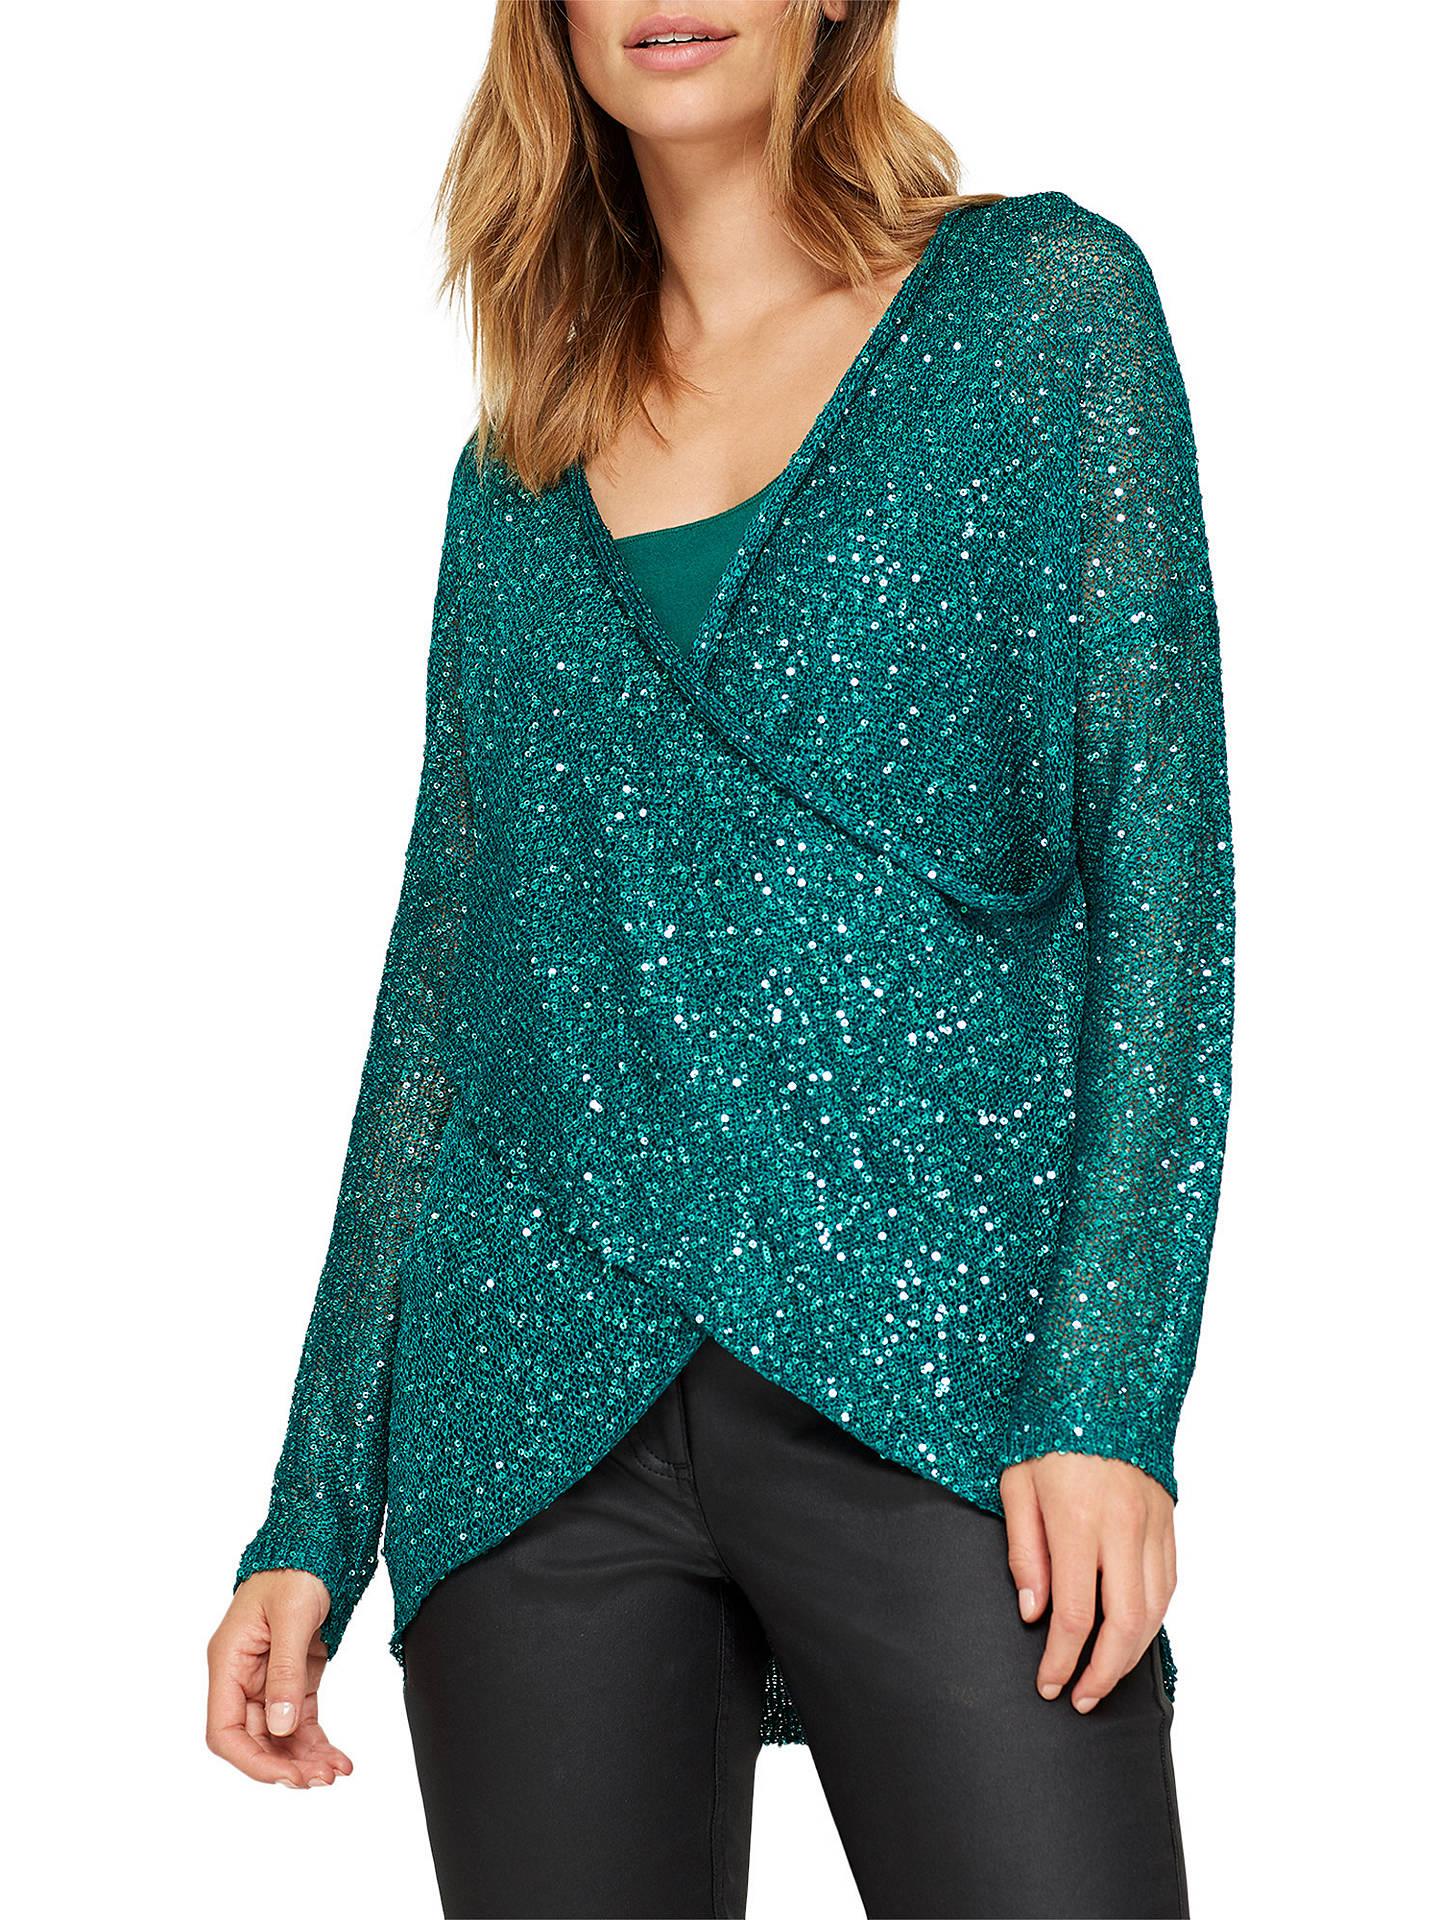 95d3a9b7f66 Buy Damsel in a Dress Averie Seqin Knitted Jumper